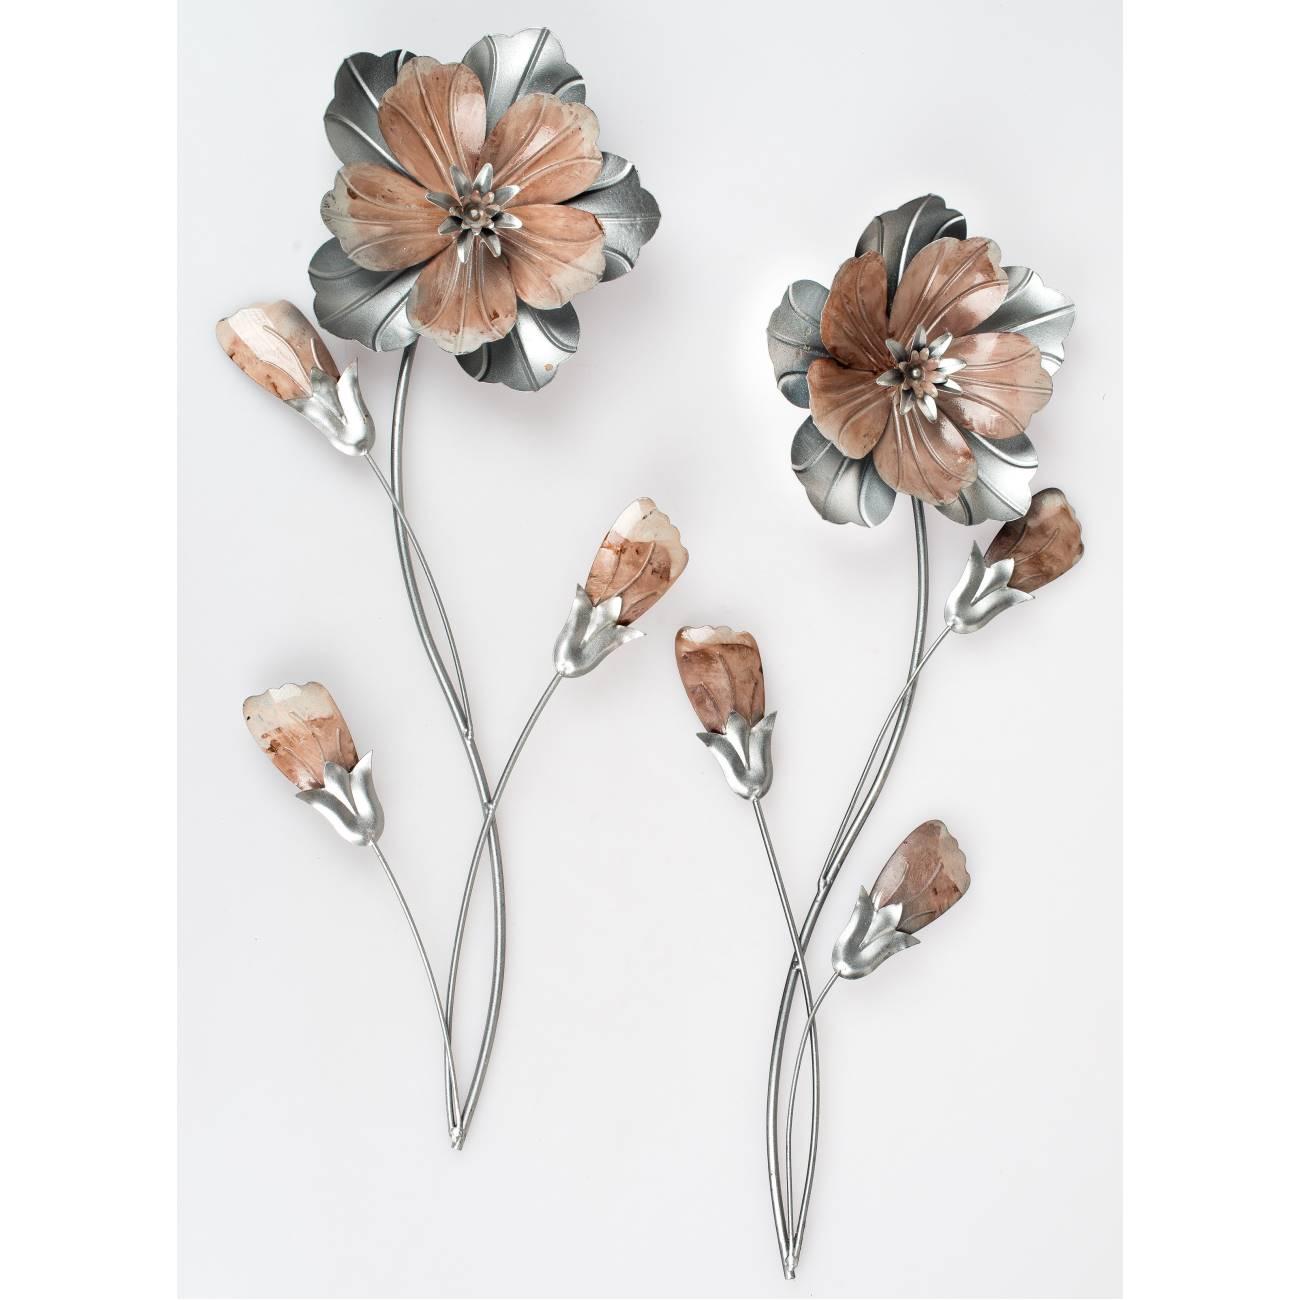 2er set wanddeko wandbild blumen h 58cm rosa silber metall formano 4025809672728 ebay. Black Bedroom Furniture Sets. Home Design Ideas